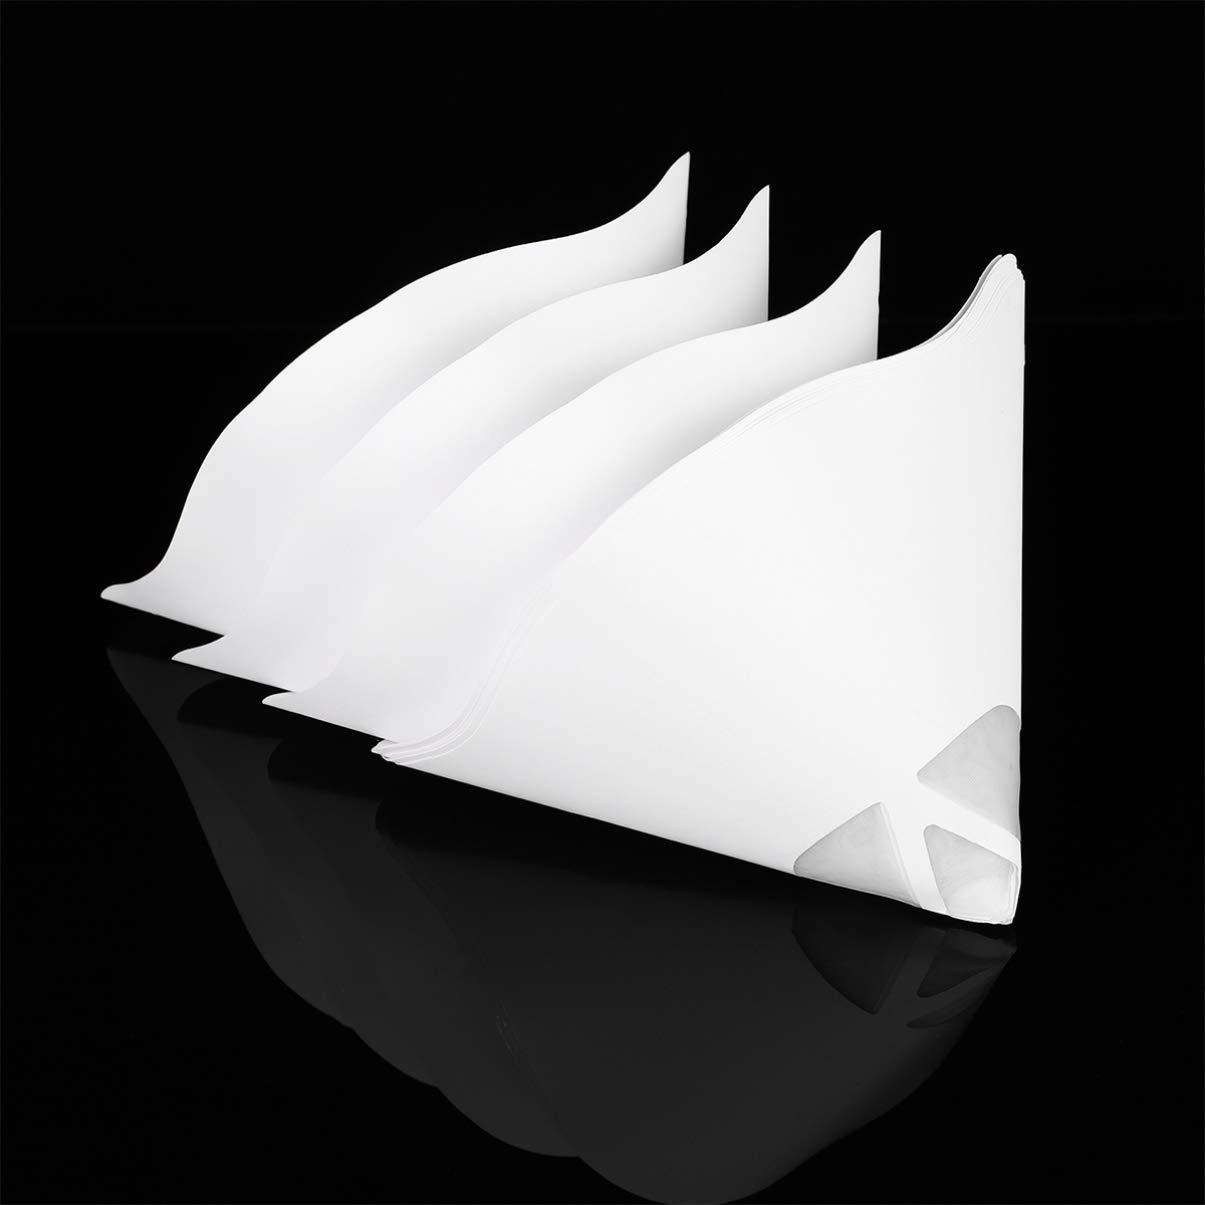 Lightweight Disposable Convenient Paper Filter Filament Filter Disposable Filter for Photon UV SLA 3D Printer Paint Strainers 10PCS Strainer Cone UKCOCO Paper Filters